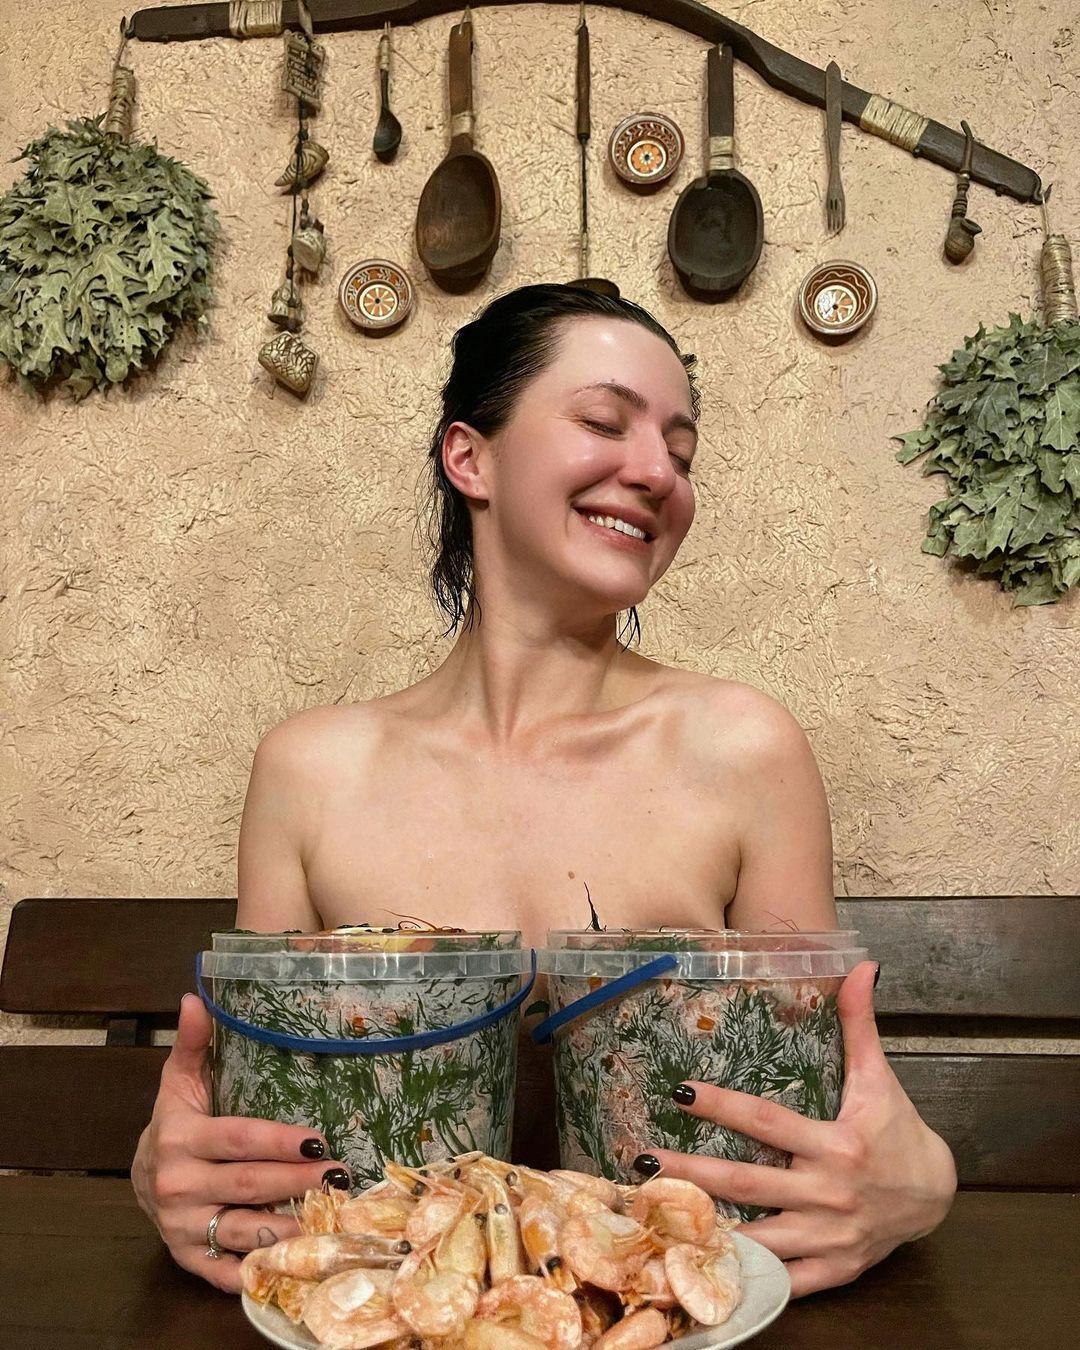 Снежана Бабкина позирует топлес в бане